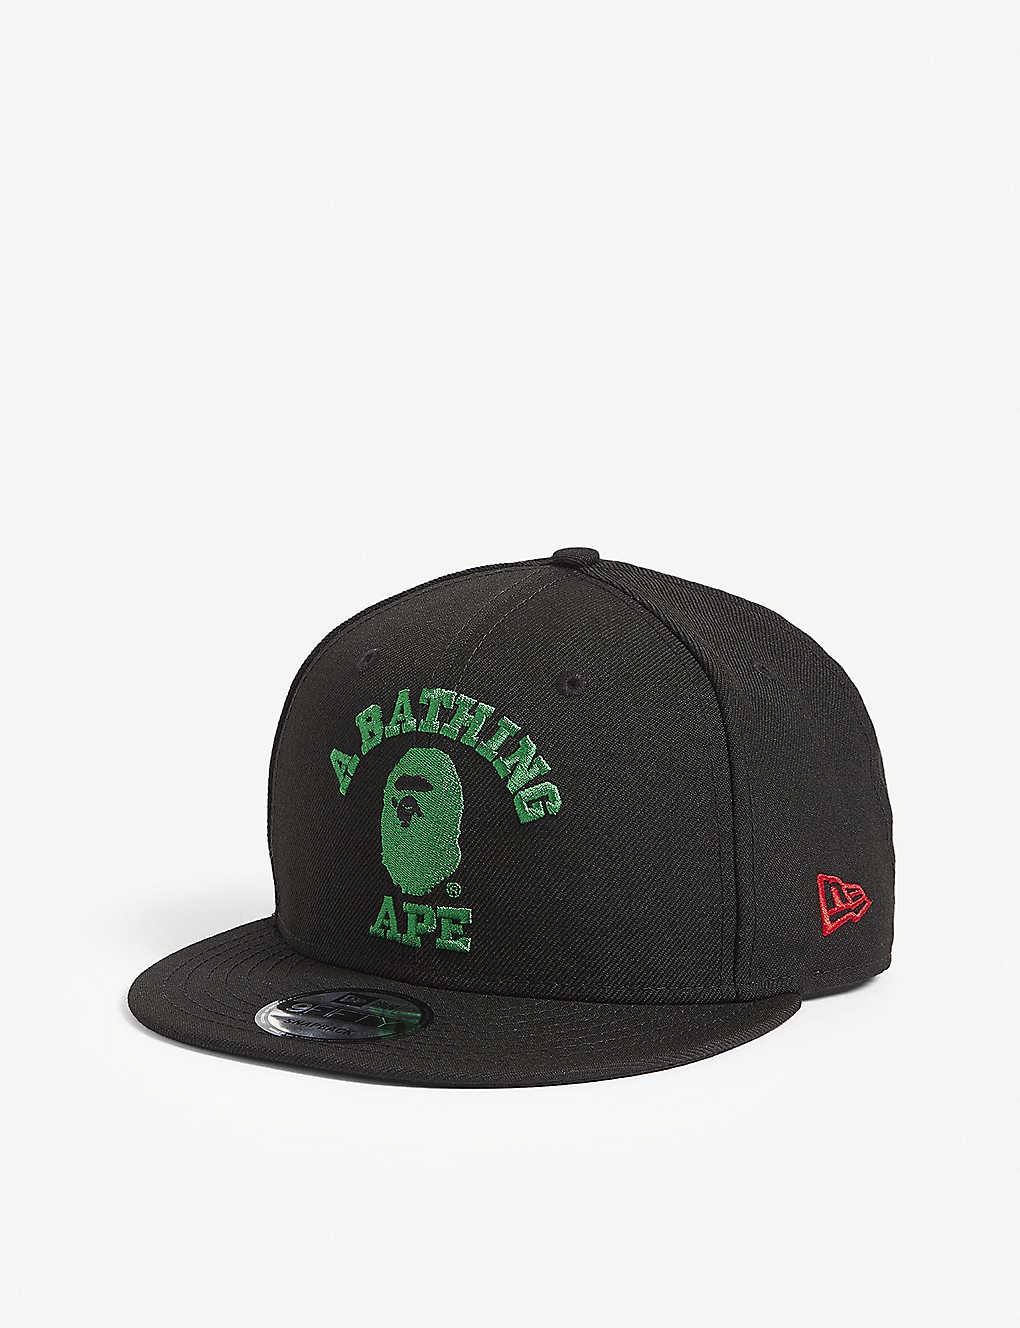 A BATHING APE - New Era embroidered logo wool snapback cap ... ebcc0edd6c3